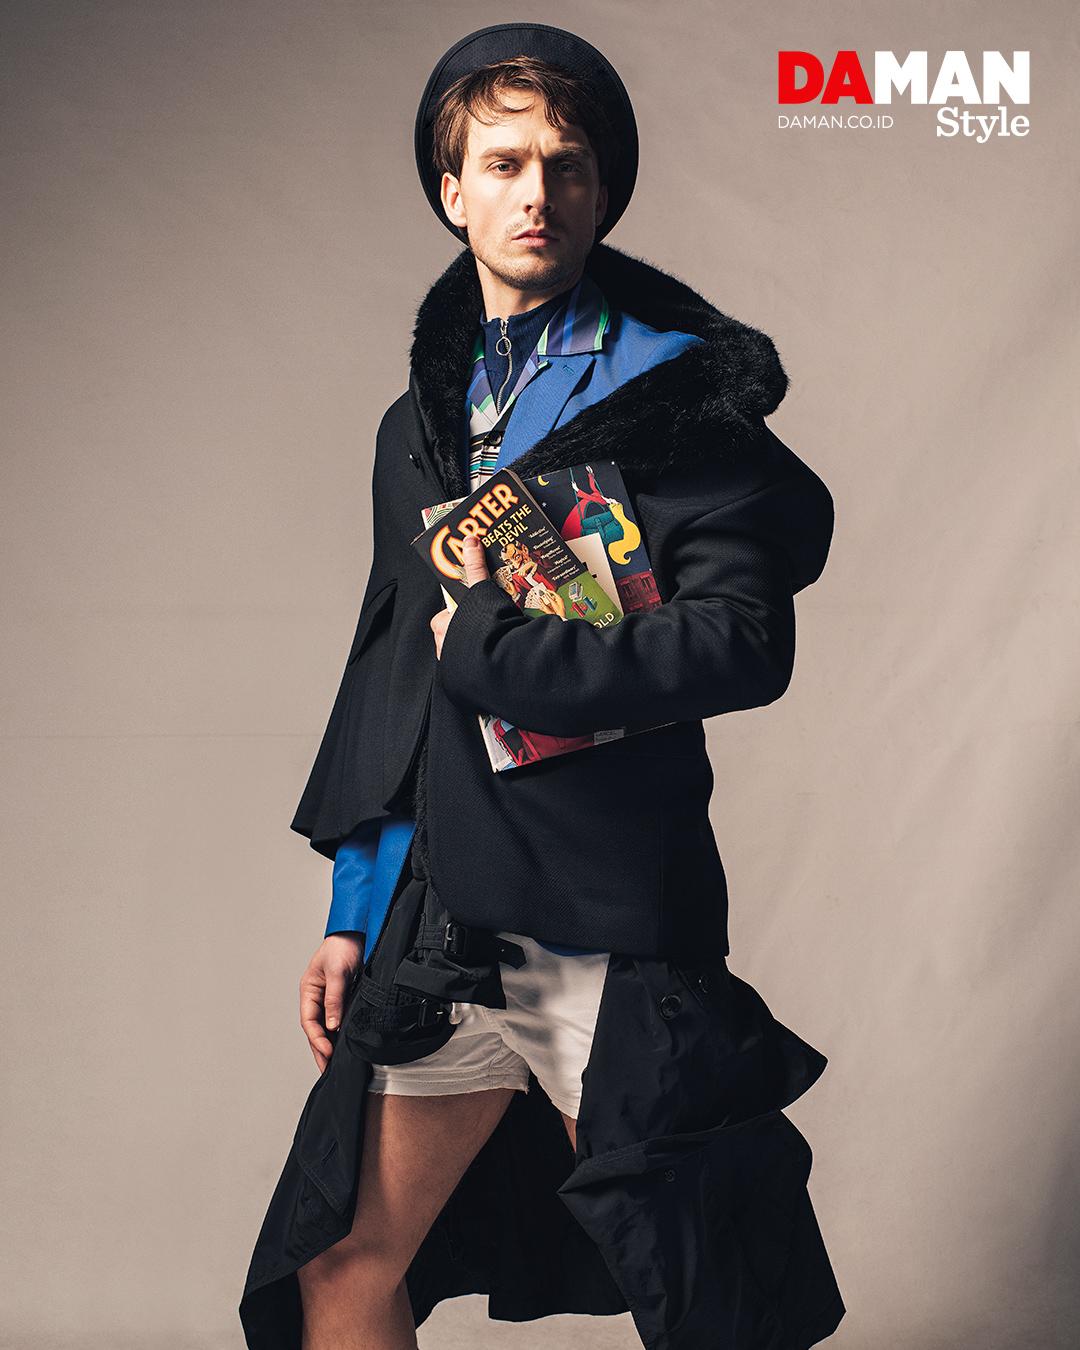 Oltin Dogaru, Ovidiu Buta, Tania Cozma, Alex Sarghe, Florin Sopcu, DEJAVU Model Management, Emporio Armani, Burberry, Prada, Abercrombie & Fitch, Hermès